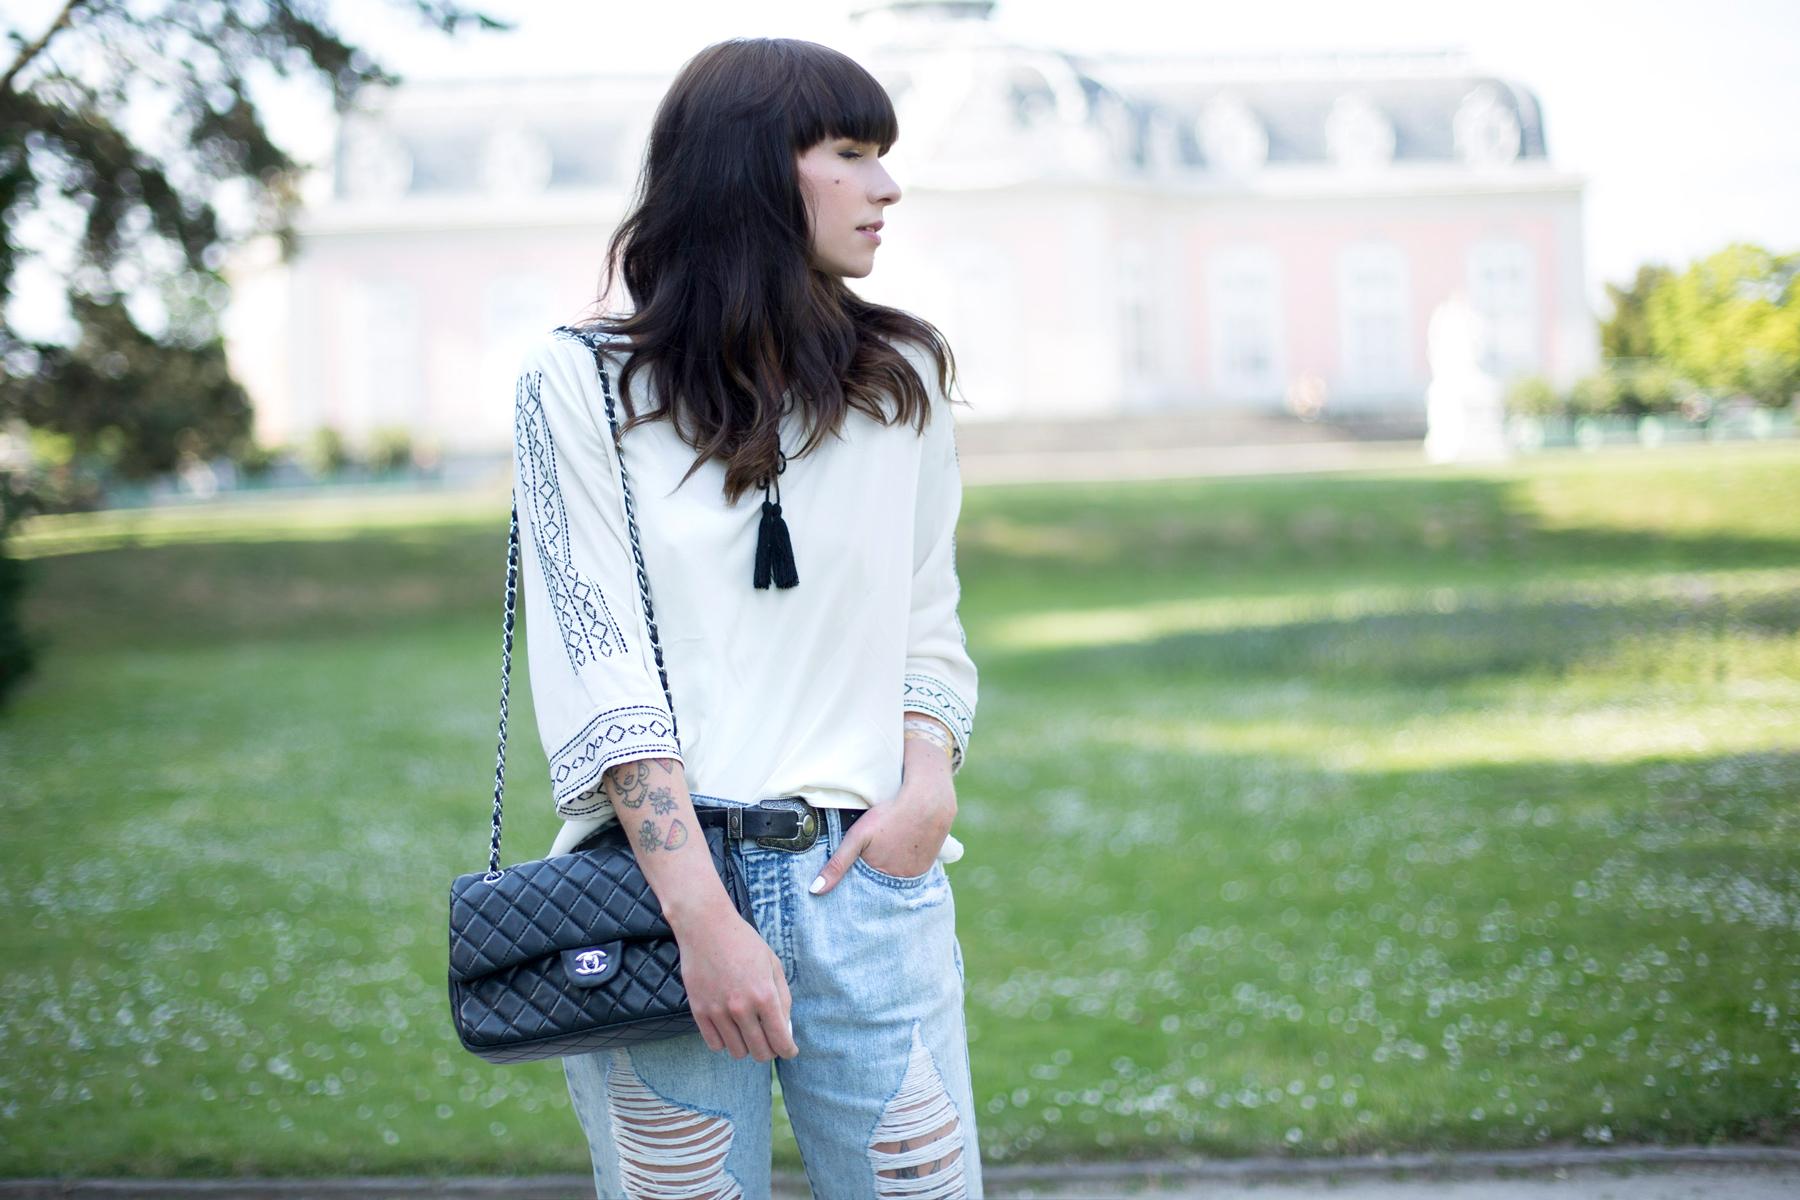 jeans girl ripped denim shopbop styling summer düsseldorf dusseldorf fashion blogger germany cats & dogs ricarda schernus 2